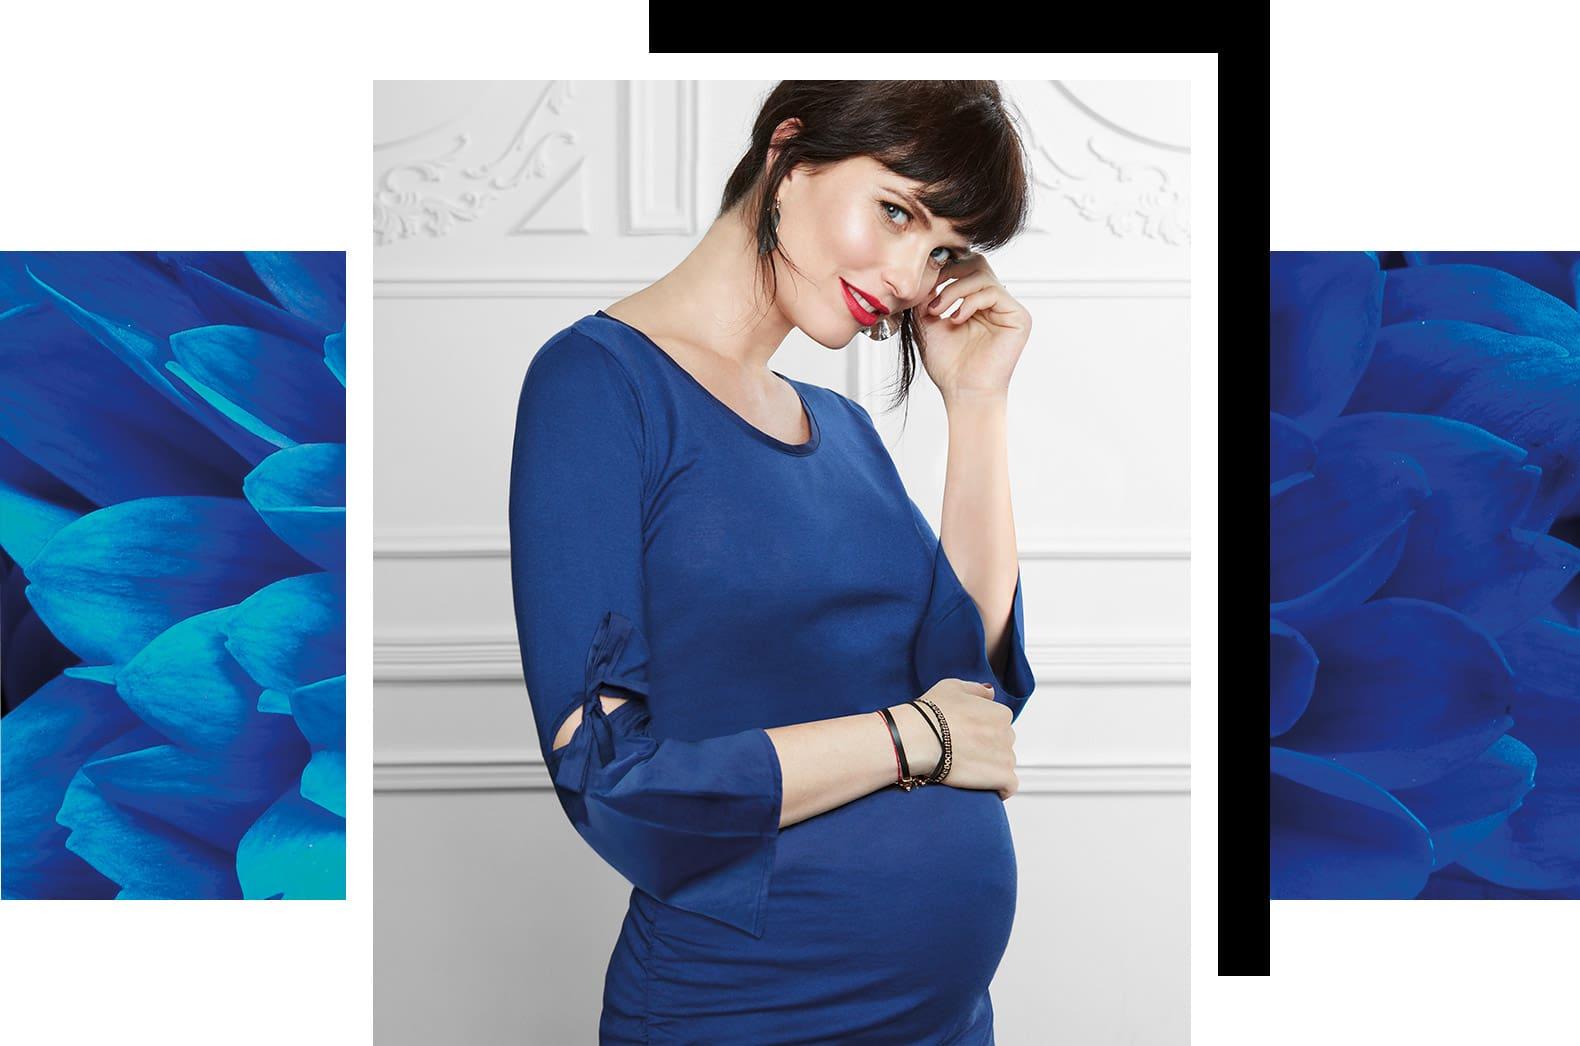 woman wearing a blue t-shirt